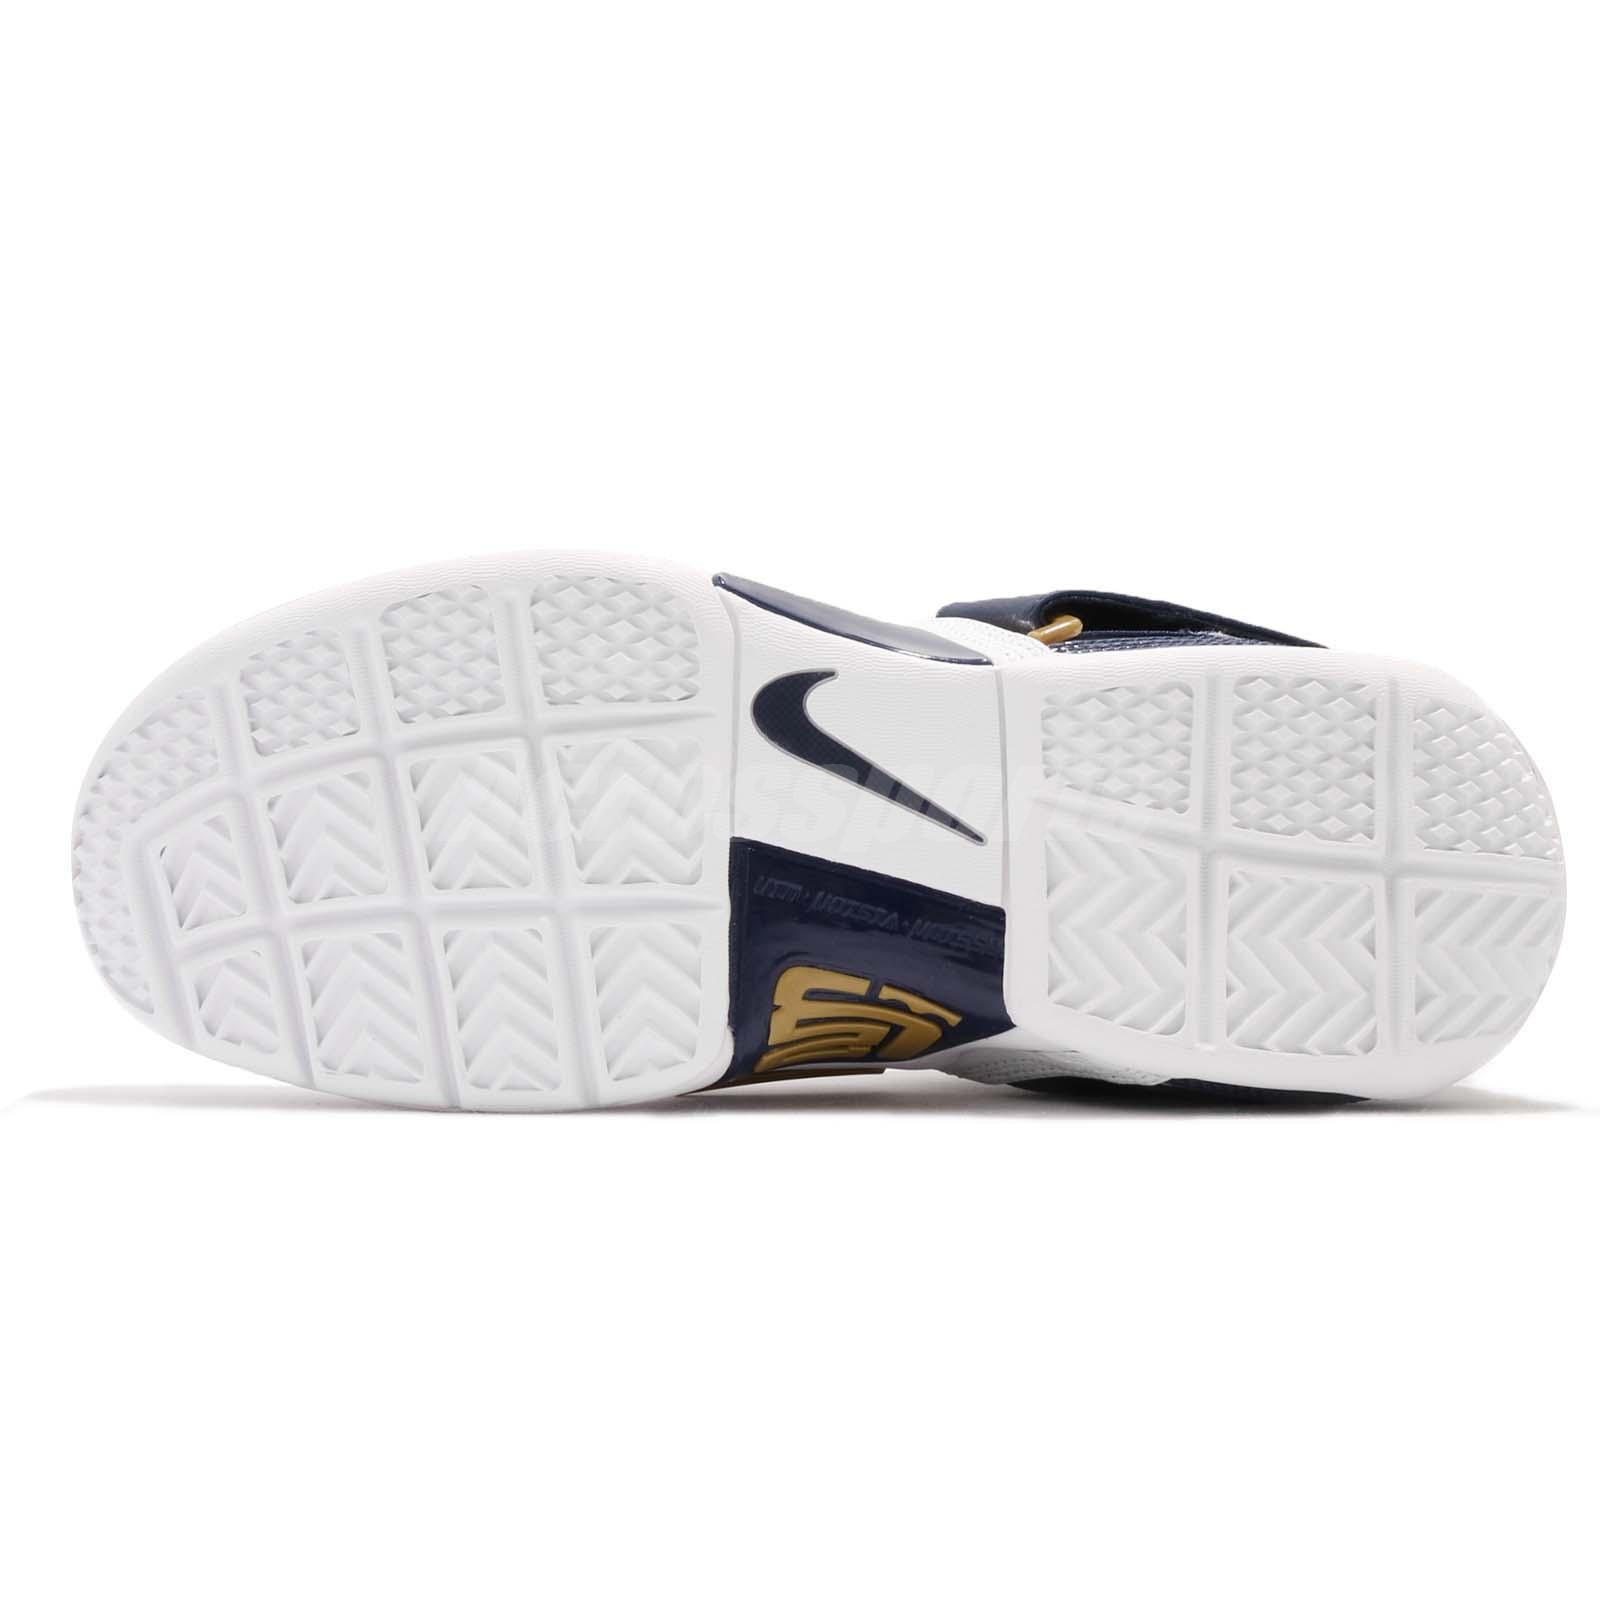 brand new 9da00 257d2 Nike Zoom LeBron Soldier CT16 QS 25 Straight James Navy White Men ...